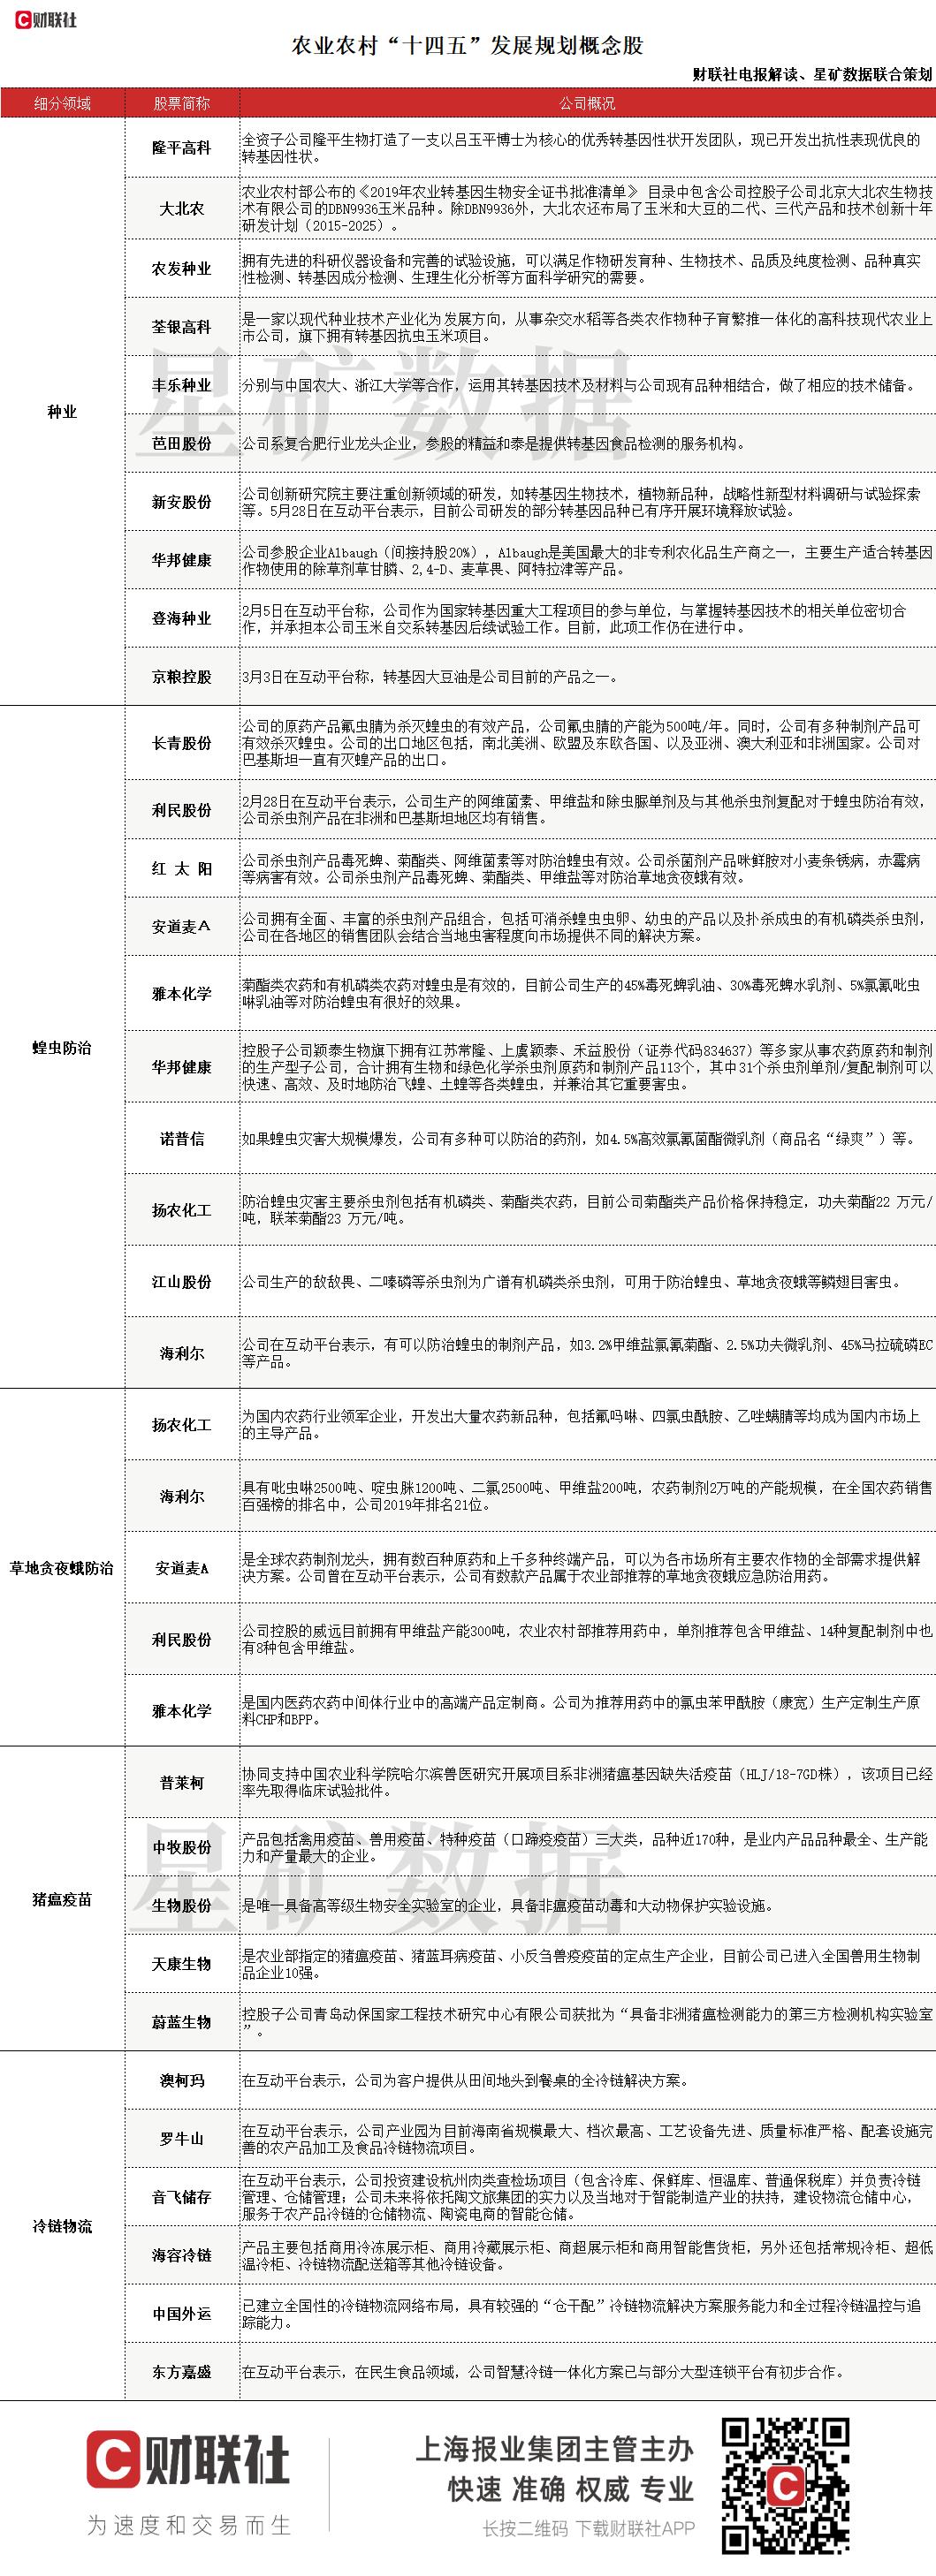 usdt不用实名(caibao.it):中央政策利好不停,权威媒体发文关注,农业股利剑出鞘? 第4张